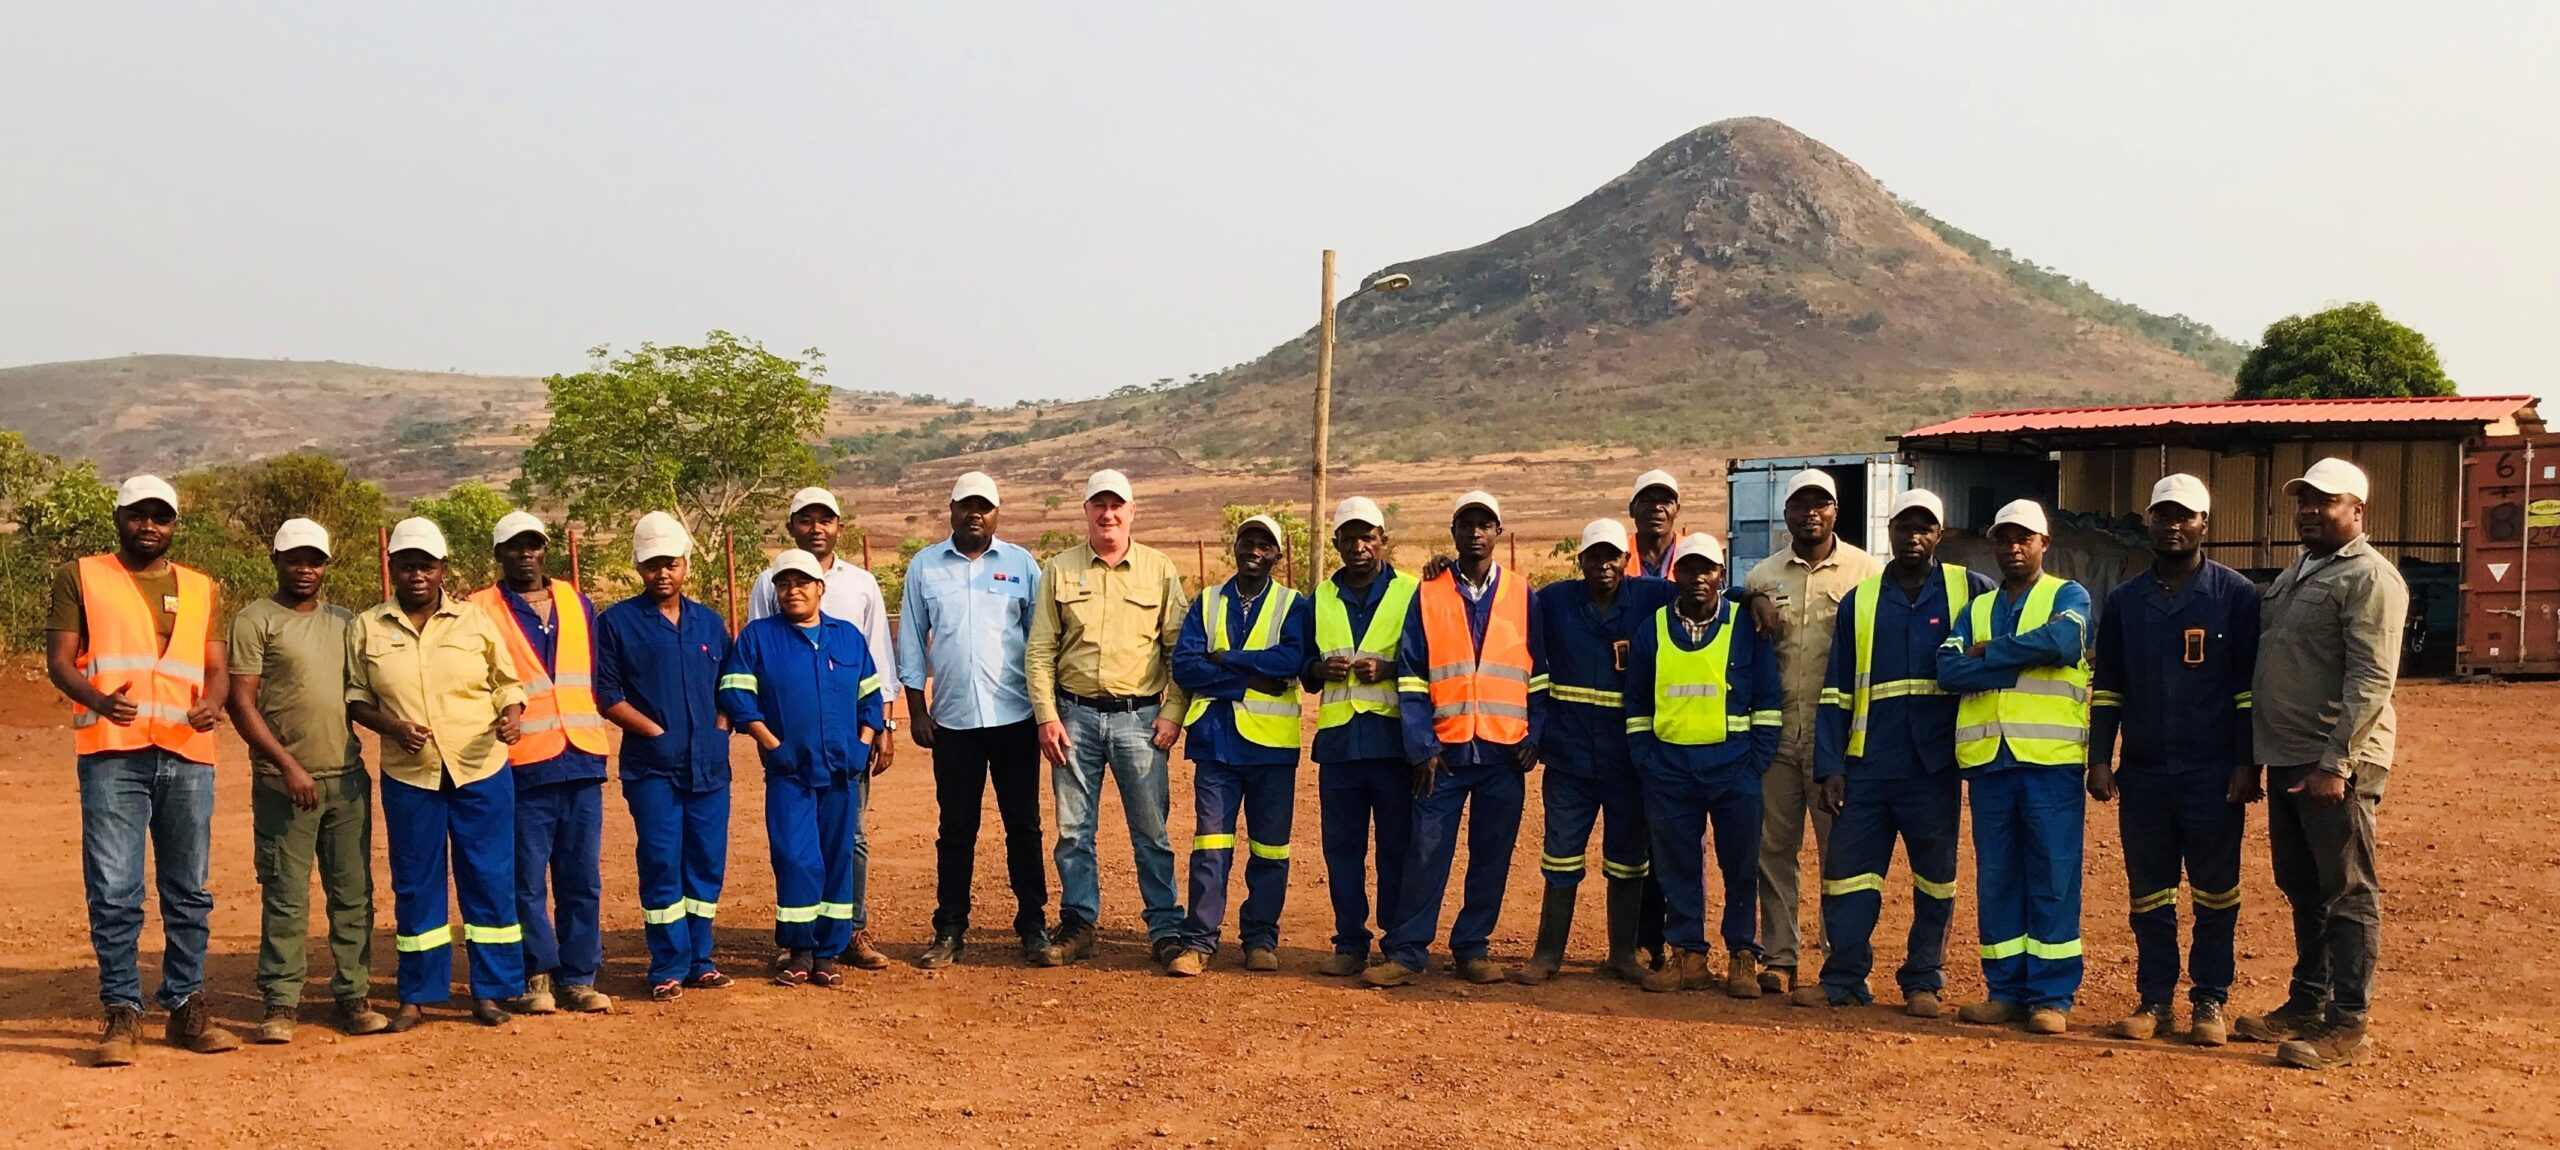 Ozango Minerais Team Photo at Longonjo